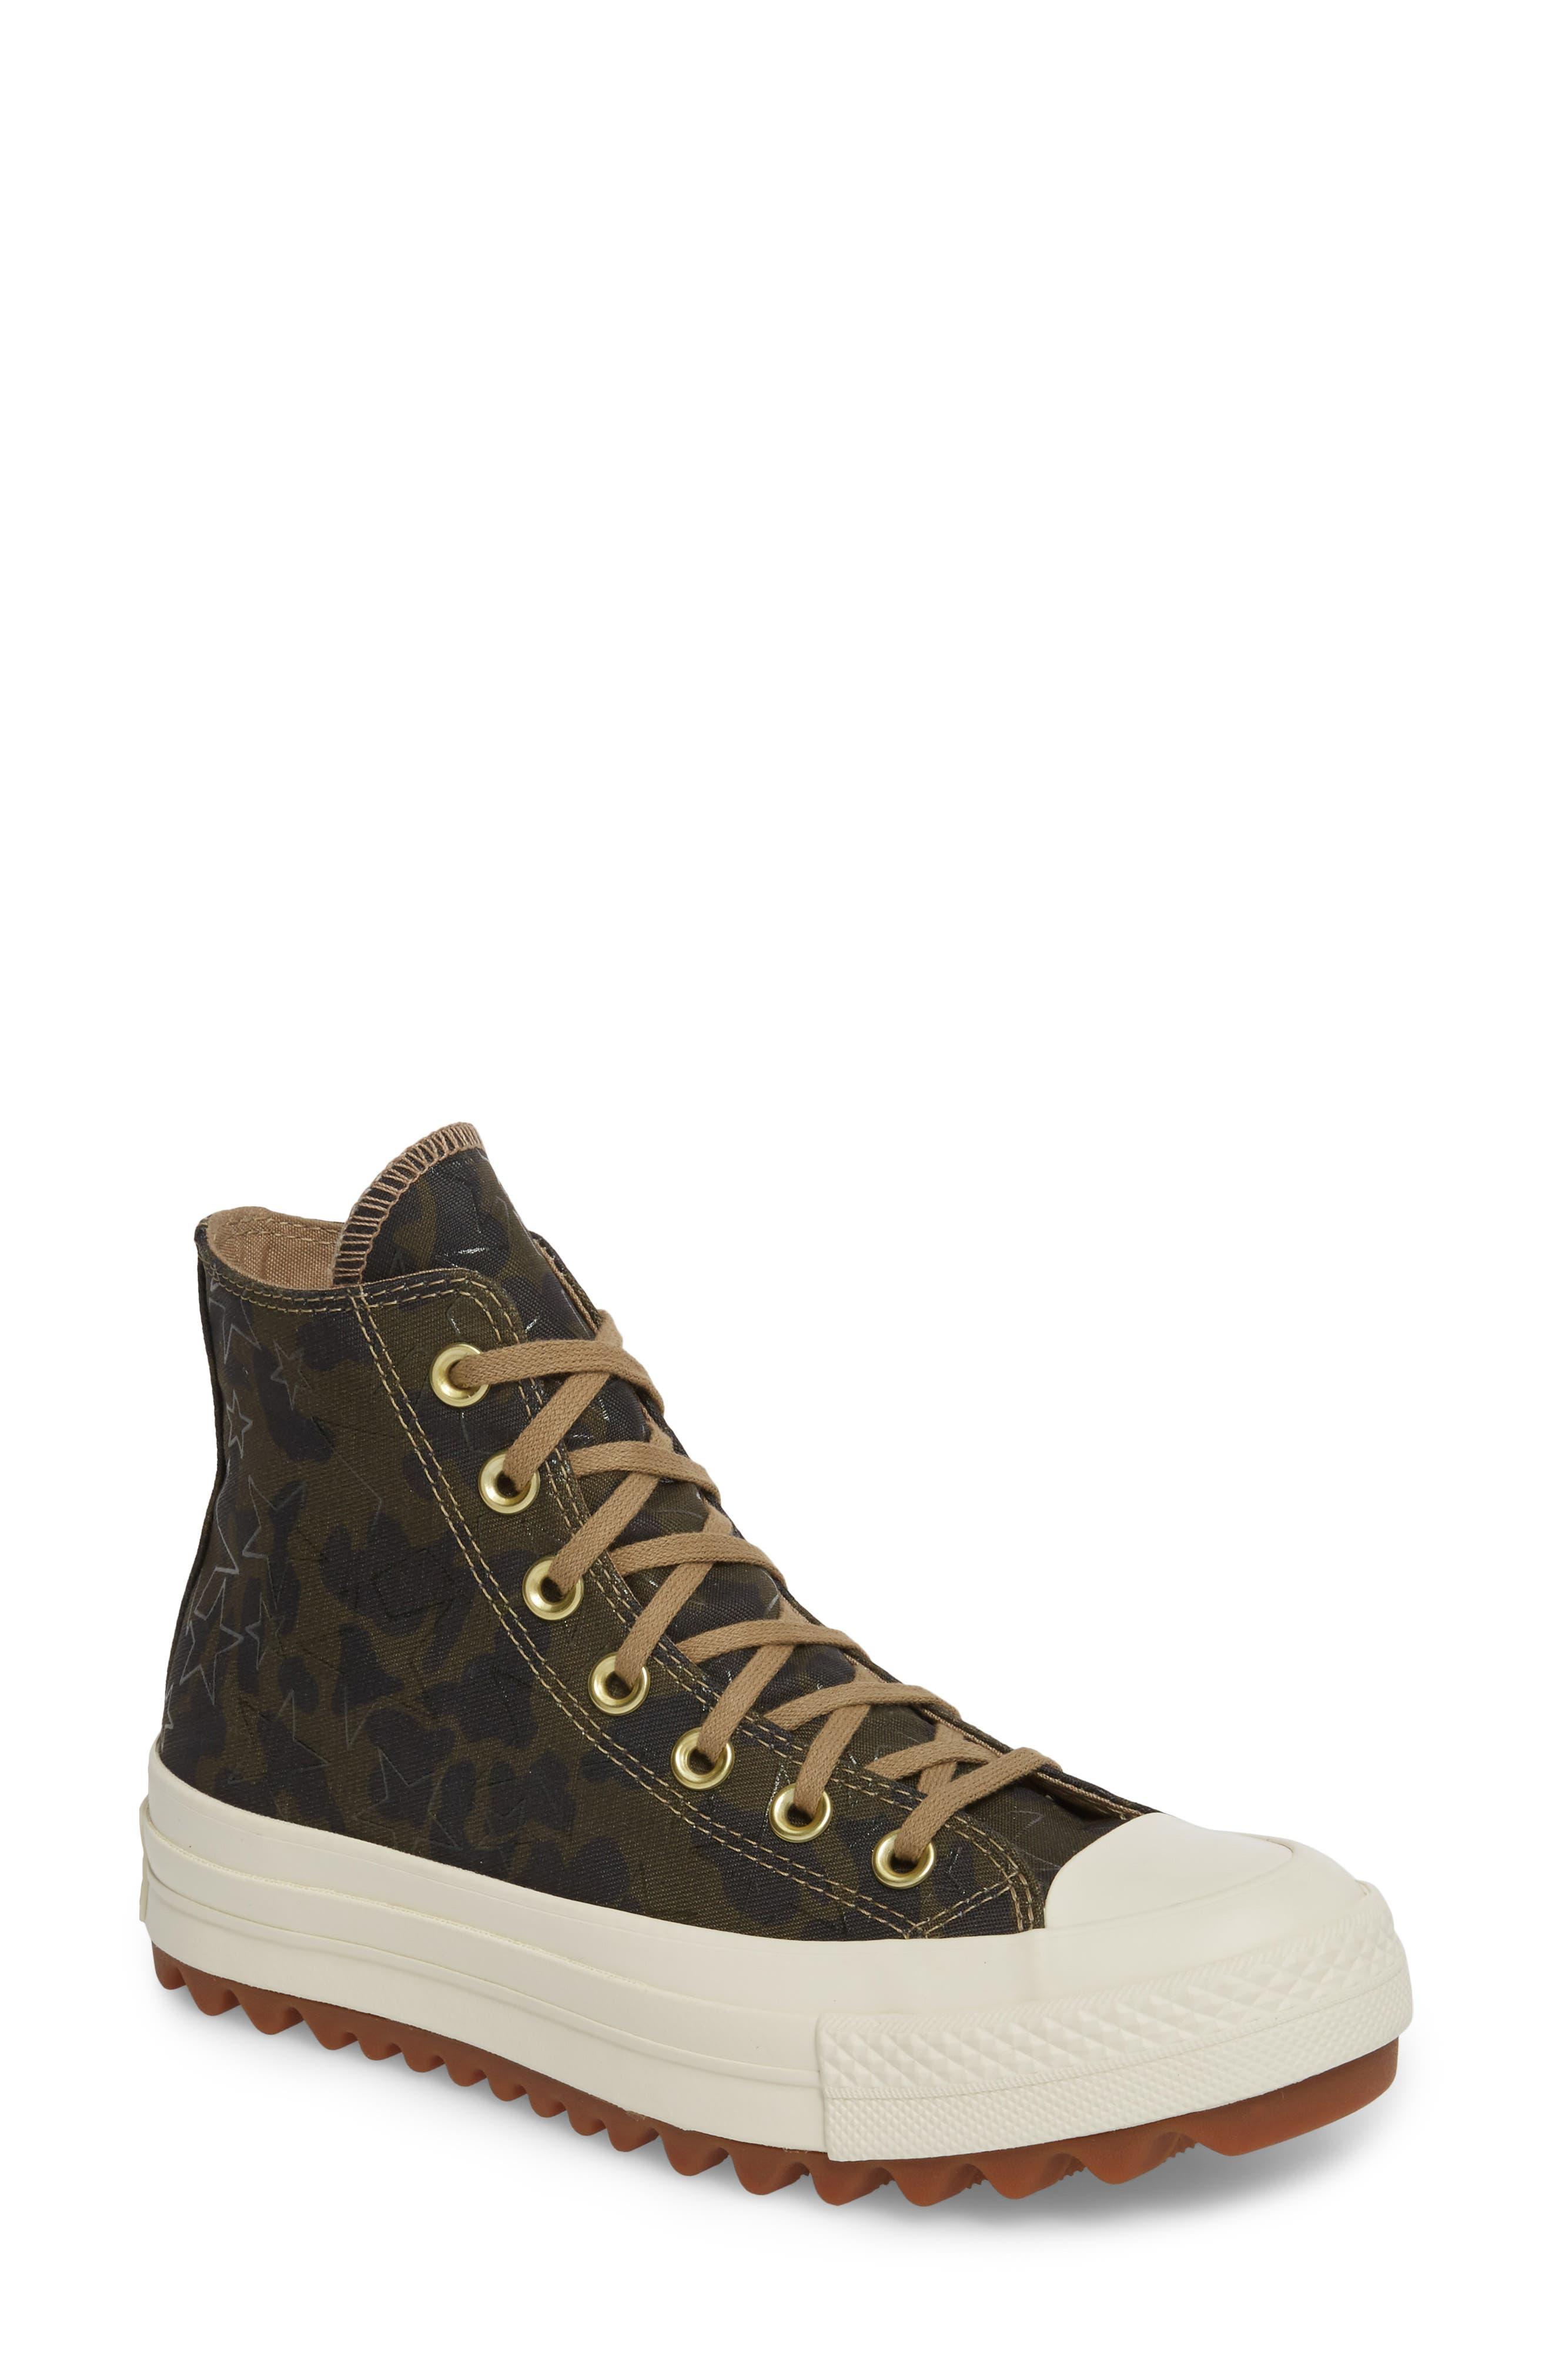 Chuck Taylor<sup>®</sup> All Star<sup>®</sup> Lift Ripple High Top Sneaker,                             Main thumbnail 1, color,                             300